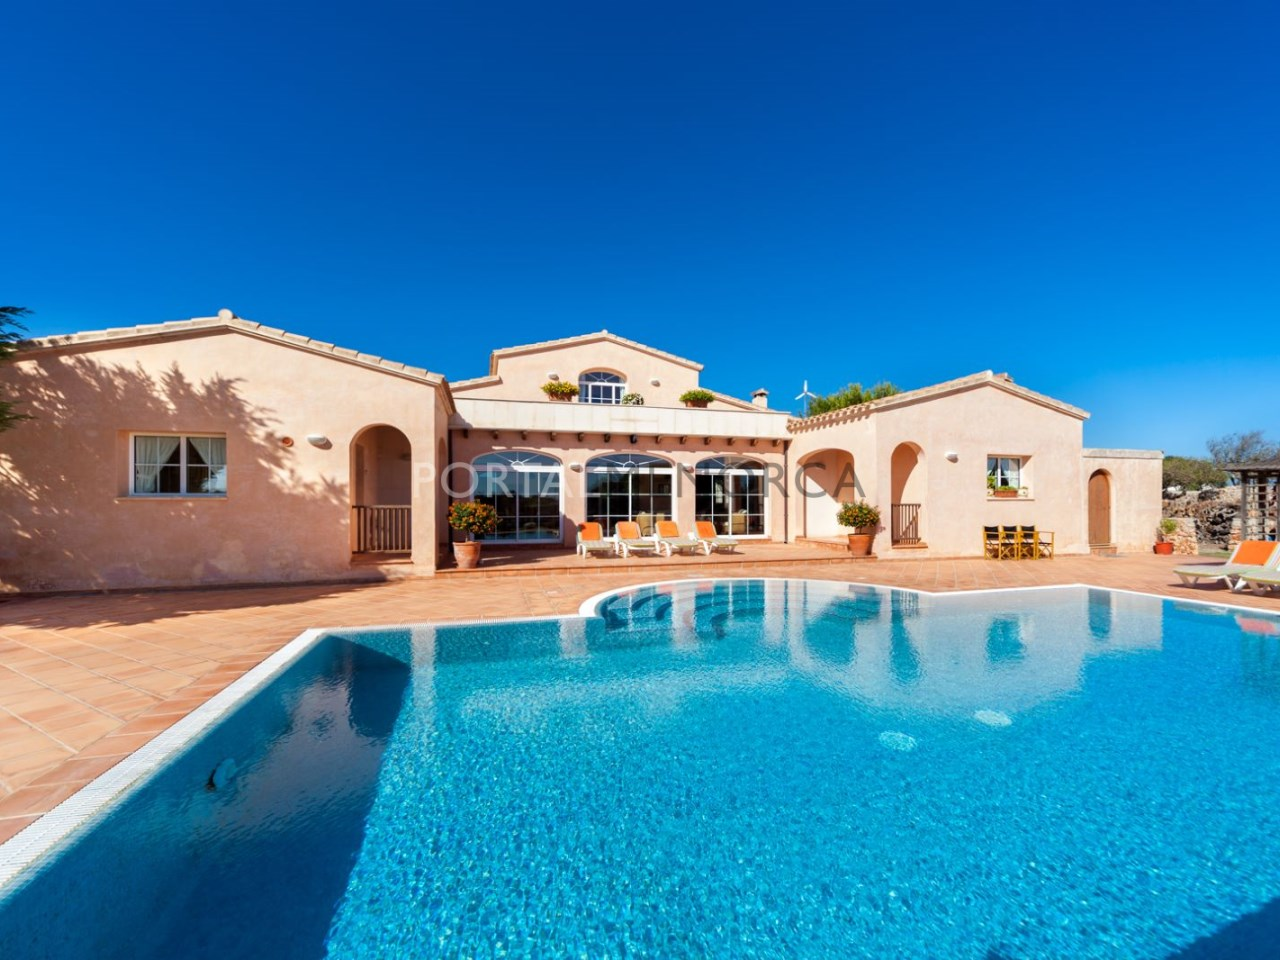 Casa de campo con piscina en Menorca (5 de 41)